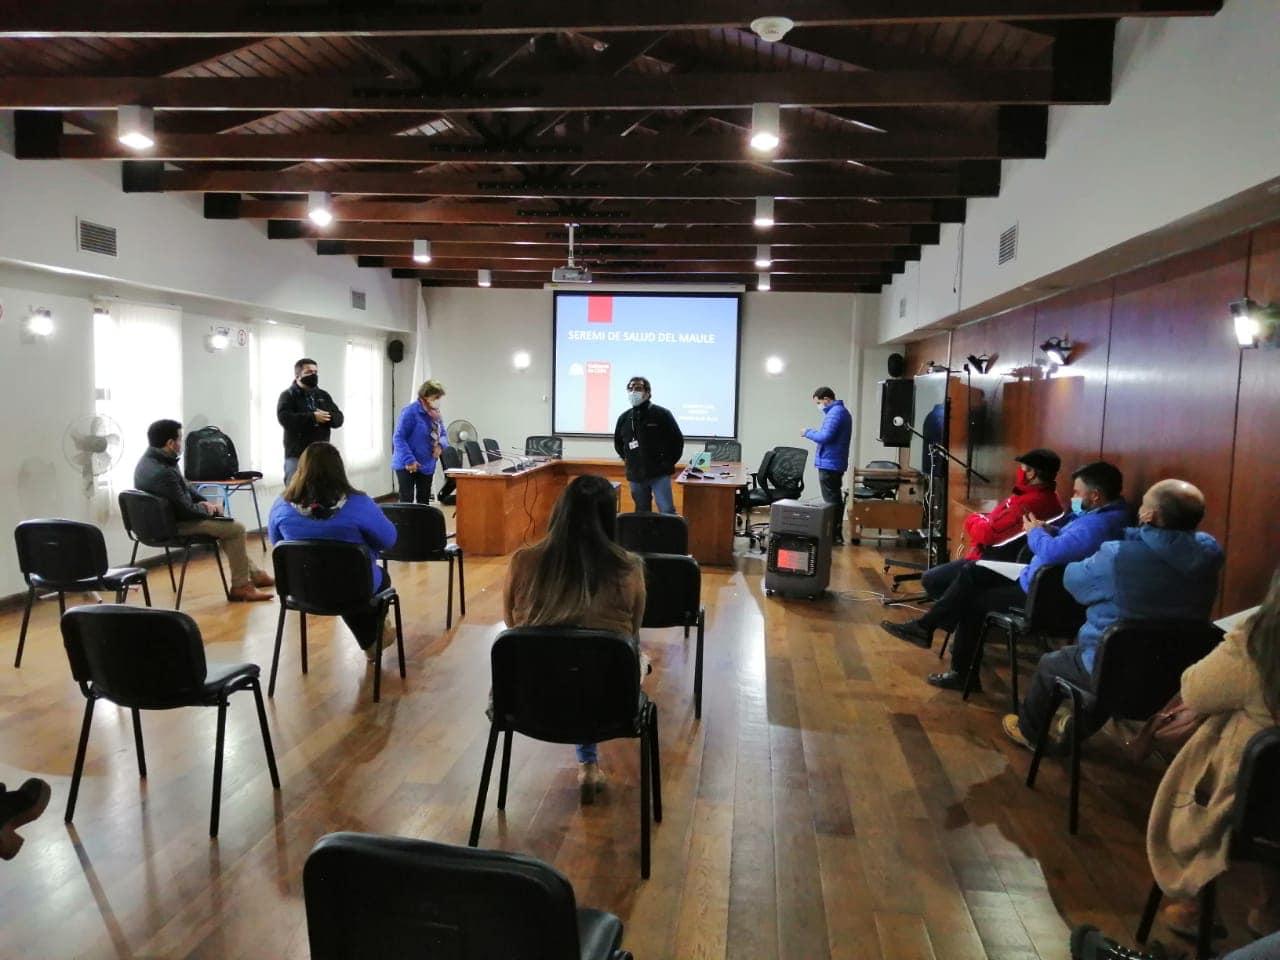 Seremi de salud del Maule capacitó a inspectores municipales de san clemente como fiscalizadores sanitarios